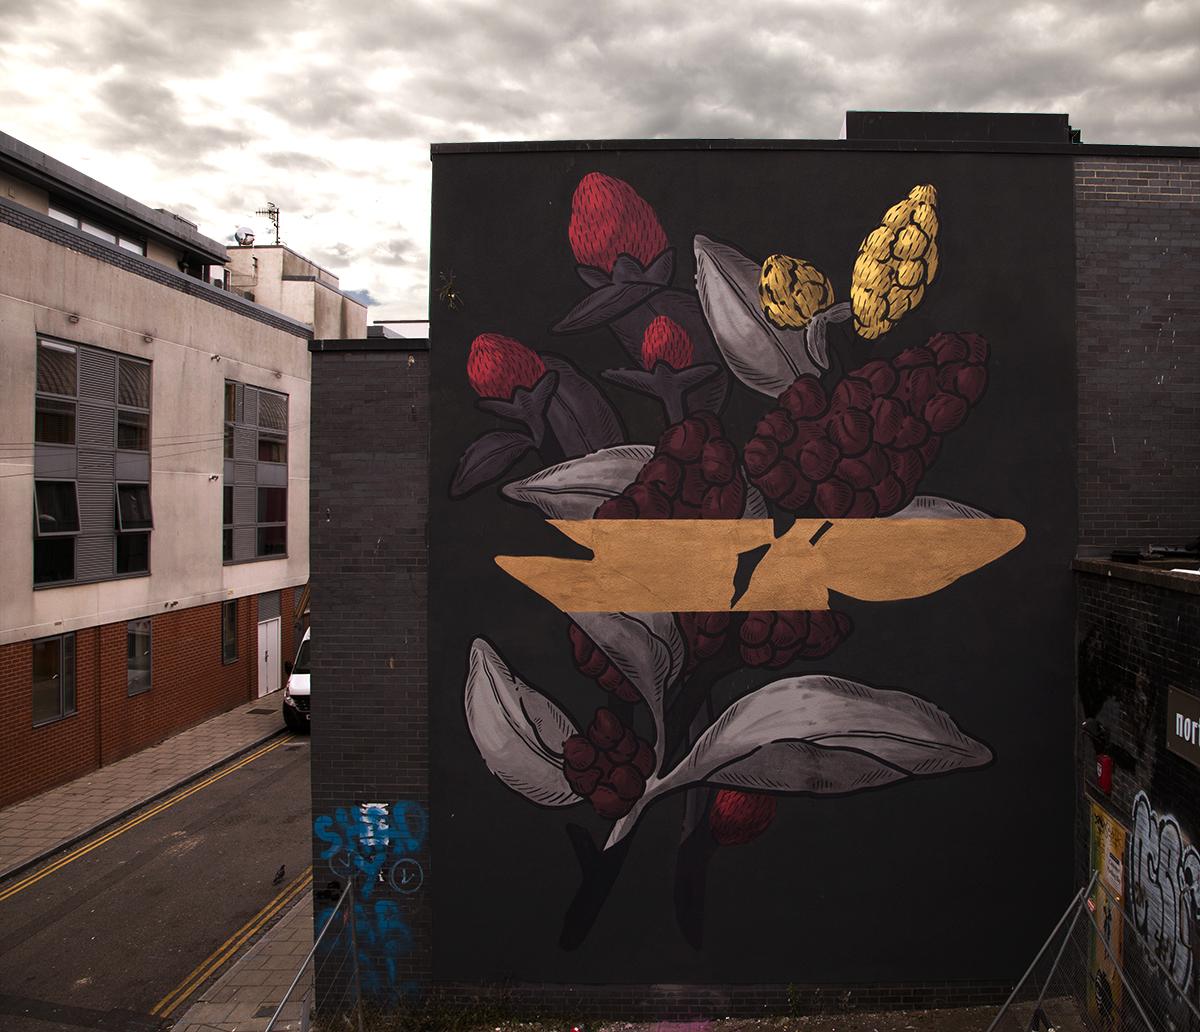 pastel-new-mural-brighton-01